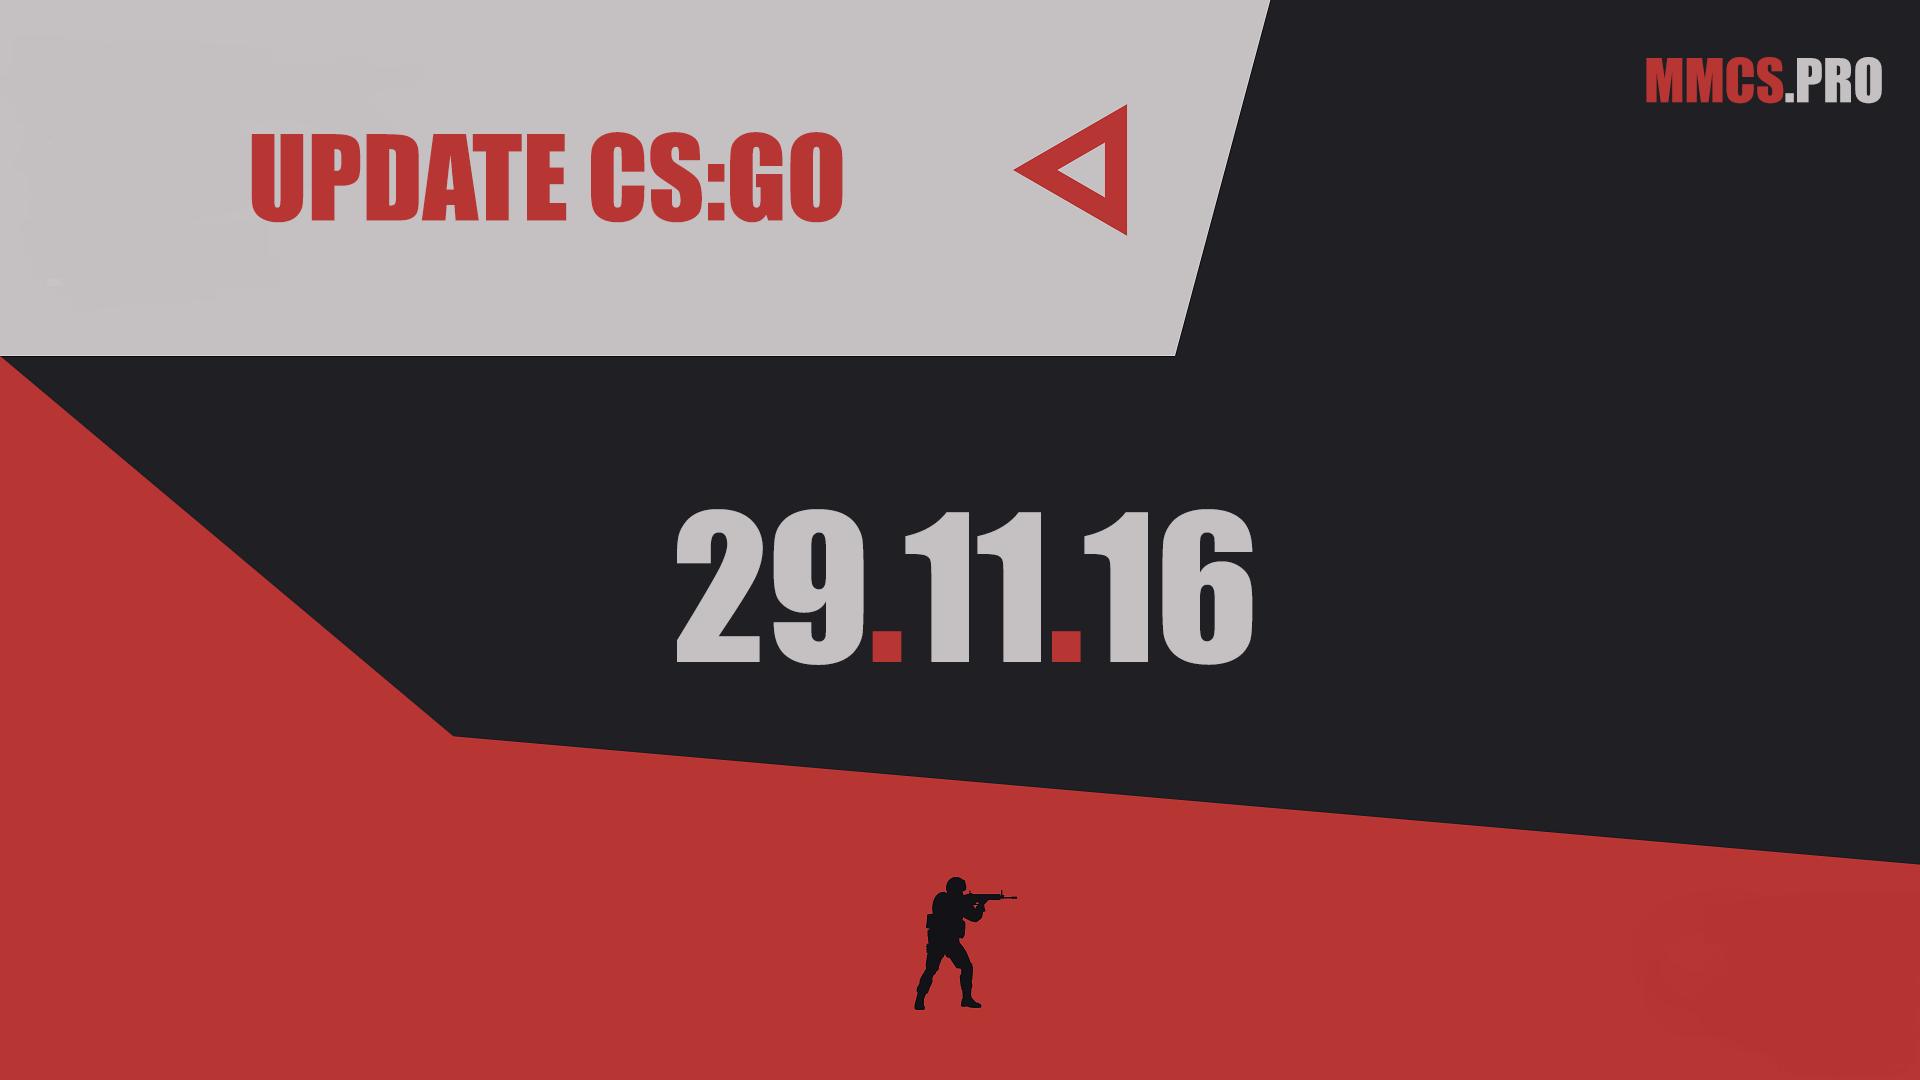 https://mmcs.pro/update-csgo-29-11-2016-valve/